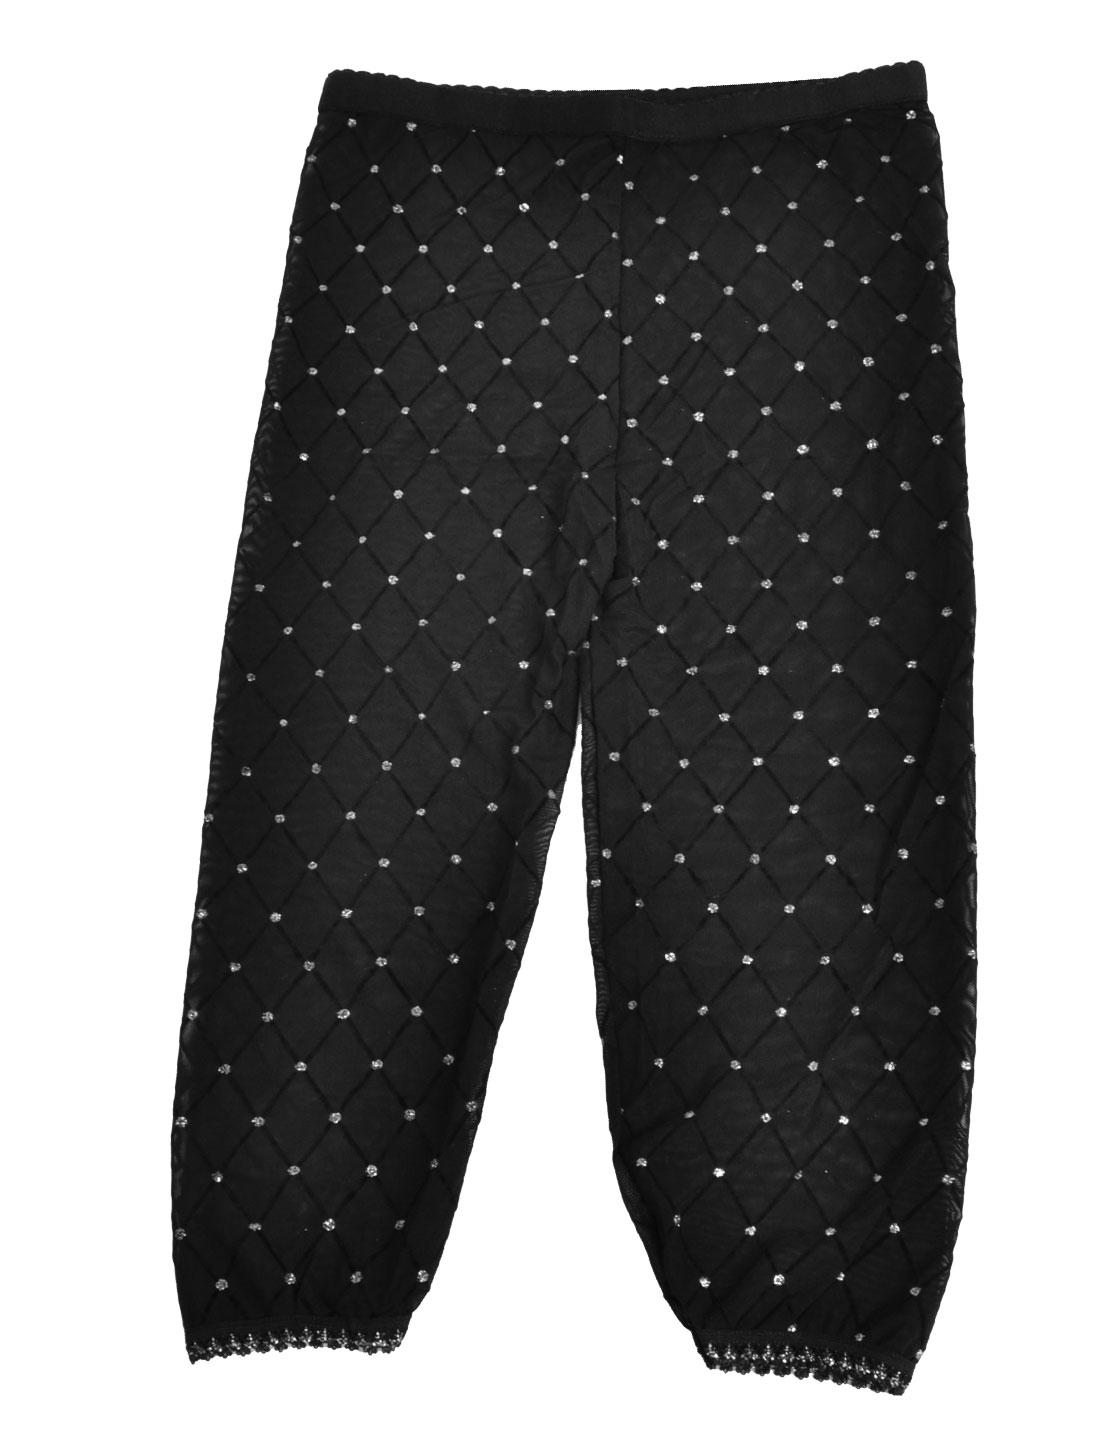 Women Stretchy Waist Transparent Cropped Leggings Pants Black S